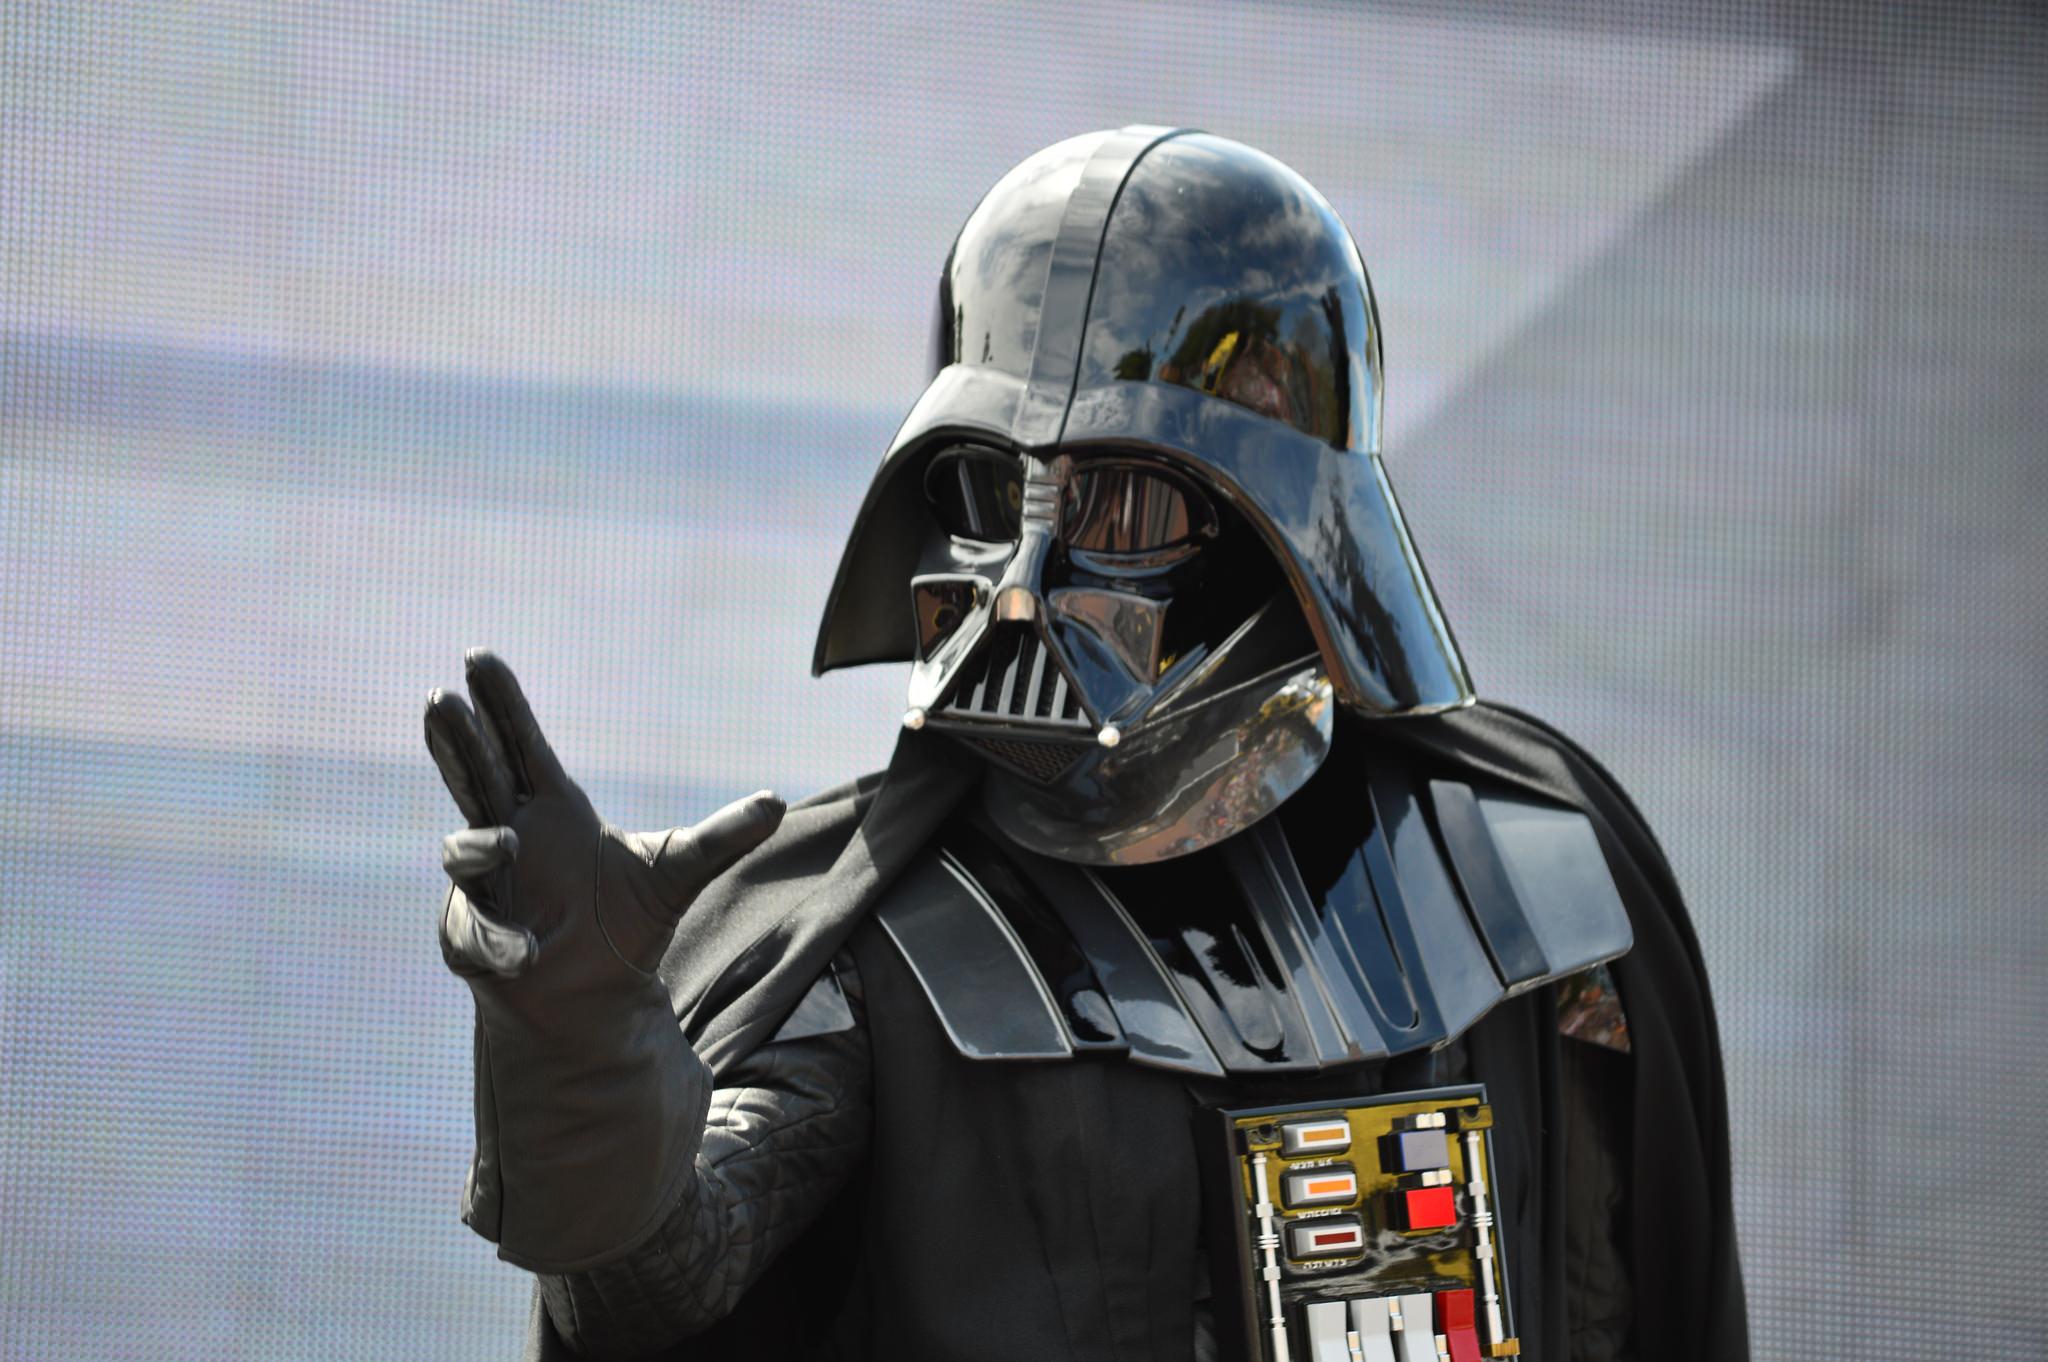 Star Wars At The Walt Disney World Resort